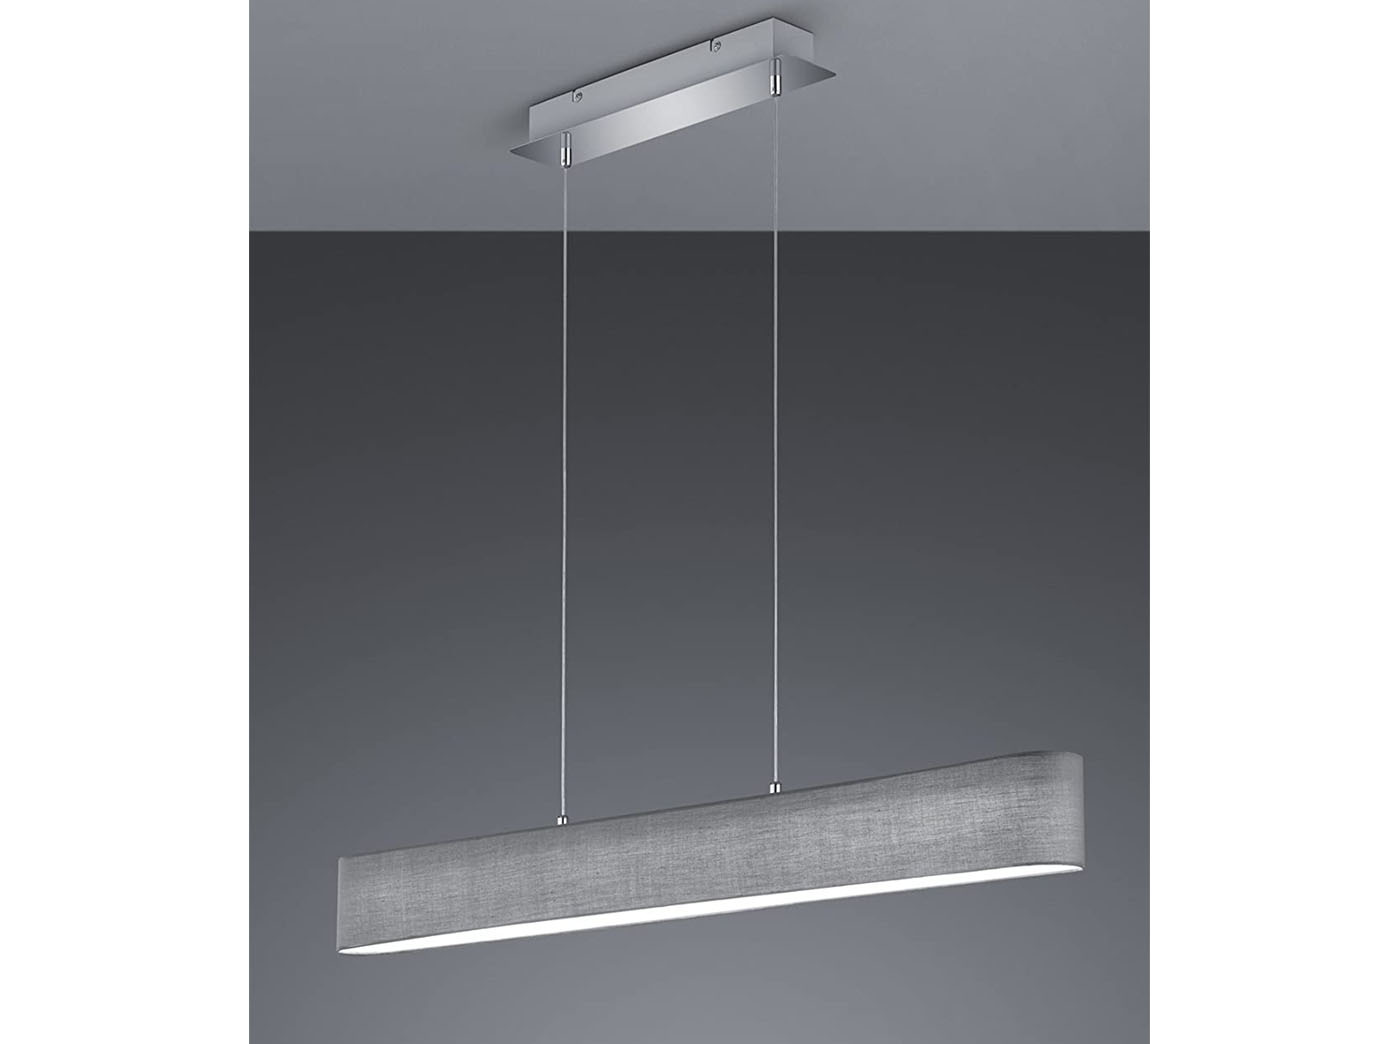 Trio stoffschirm led pendelleuchte lugano dimmbar lampe for Pendelleuchte stoffschirm